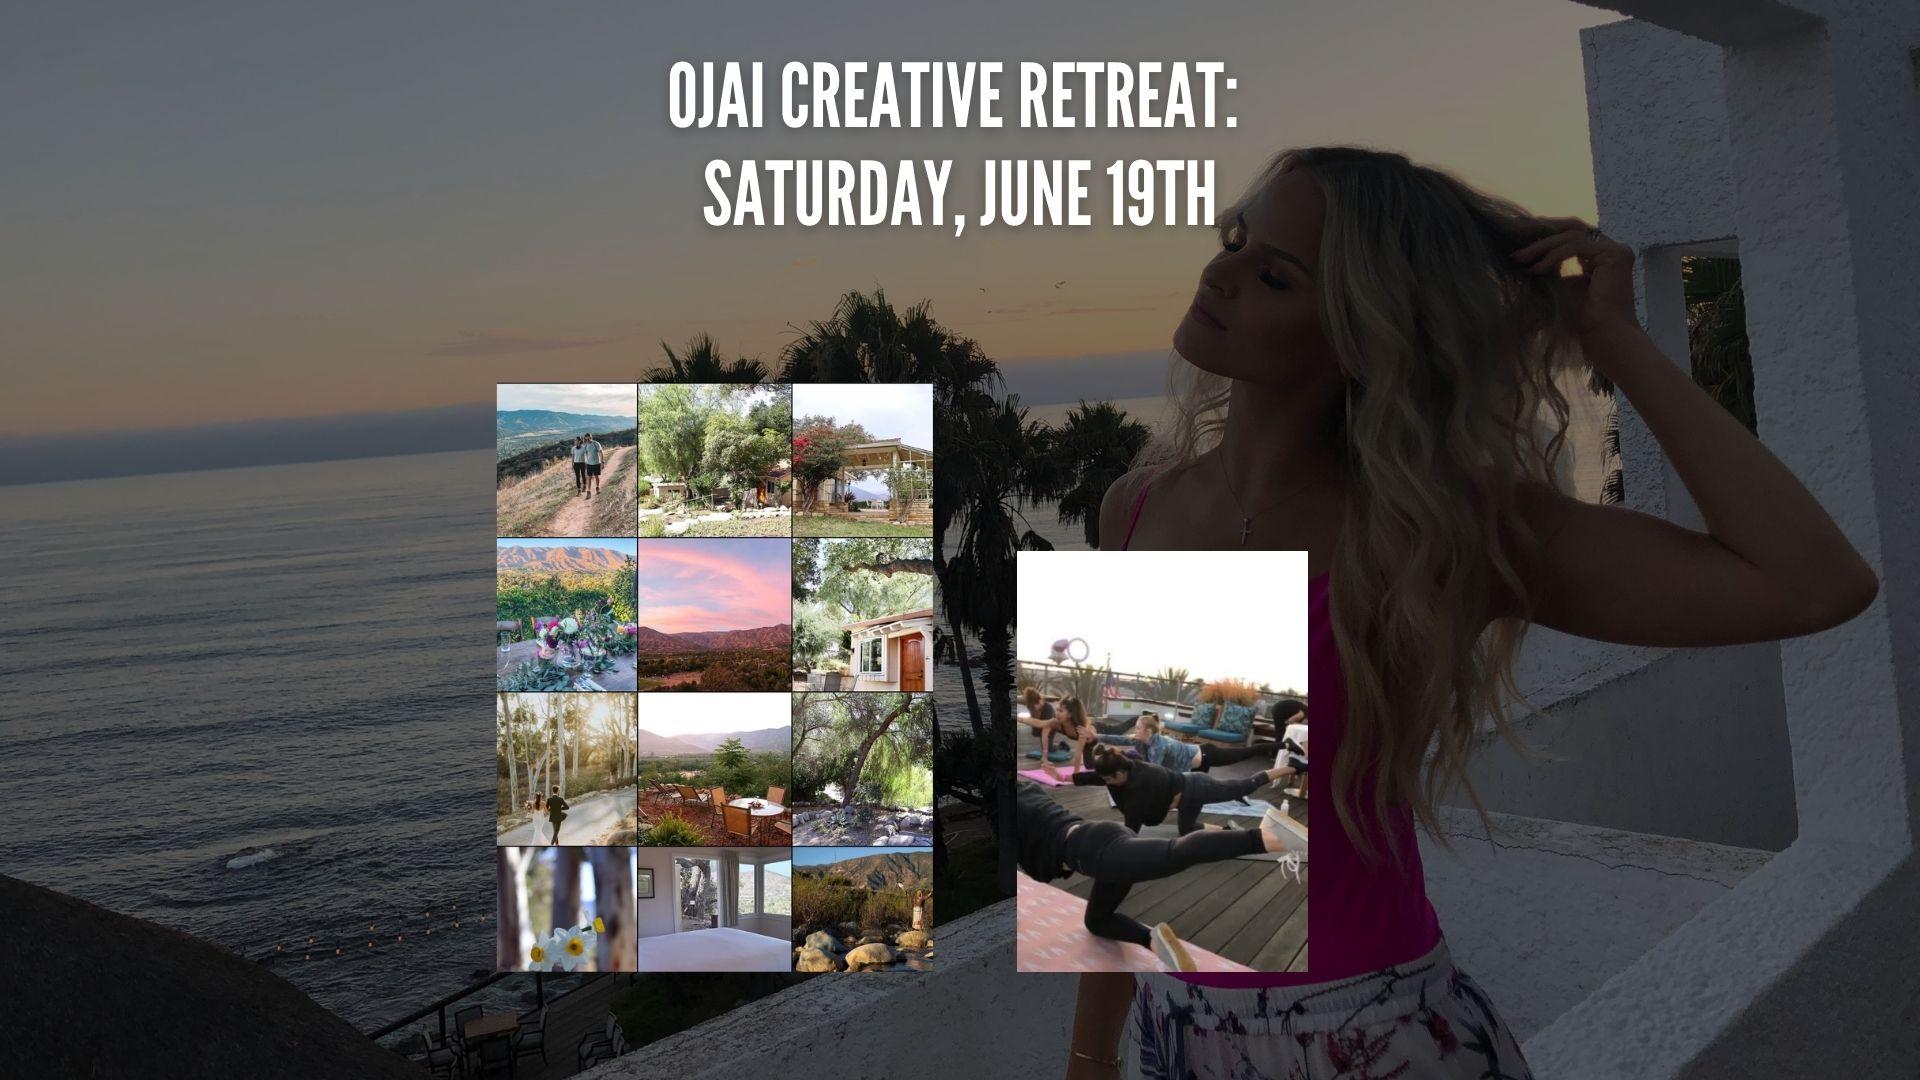 2nd quarter 3xt dance company creative retreat